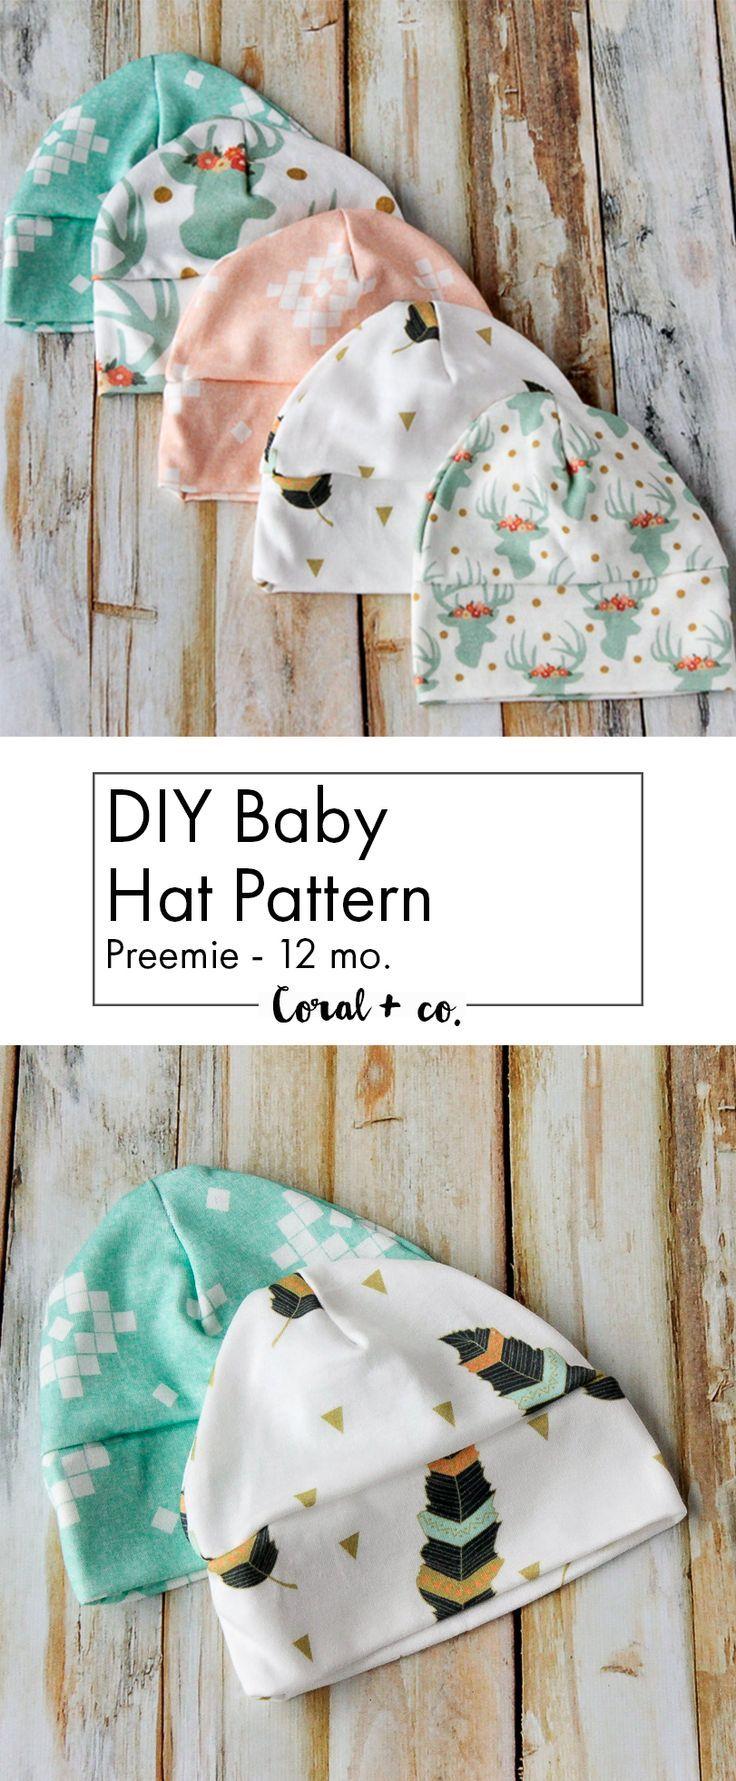 DIY Baby Hat Sewing Pattern and Tutorial in sizes Preemie - 12 ...